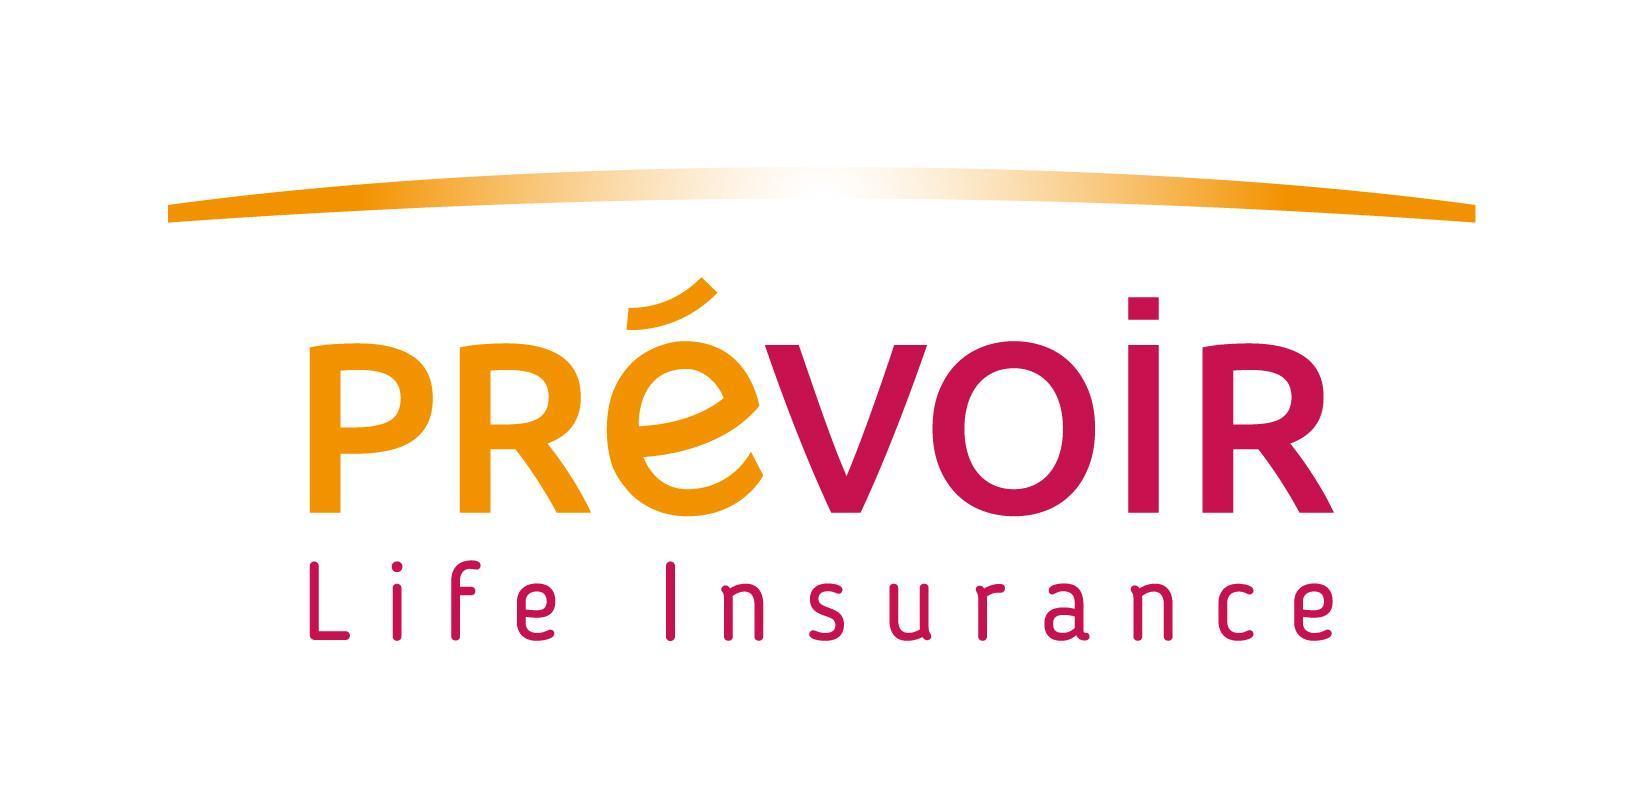 Prevoir Vietnam Life Insurance company logo